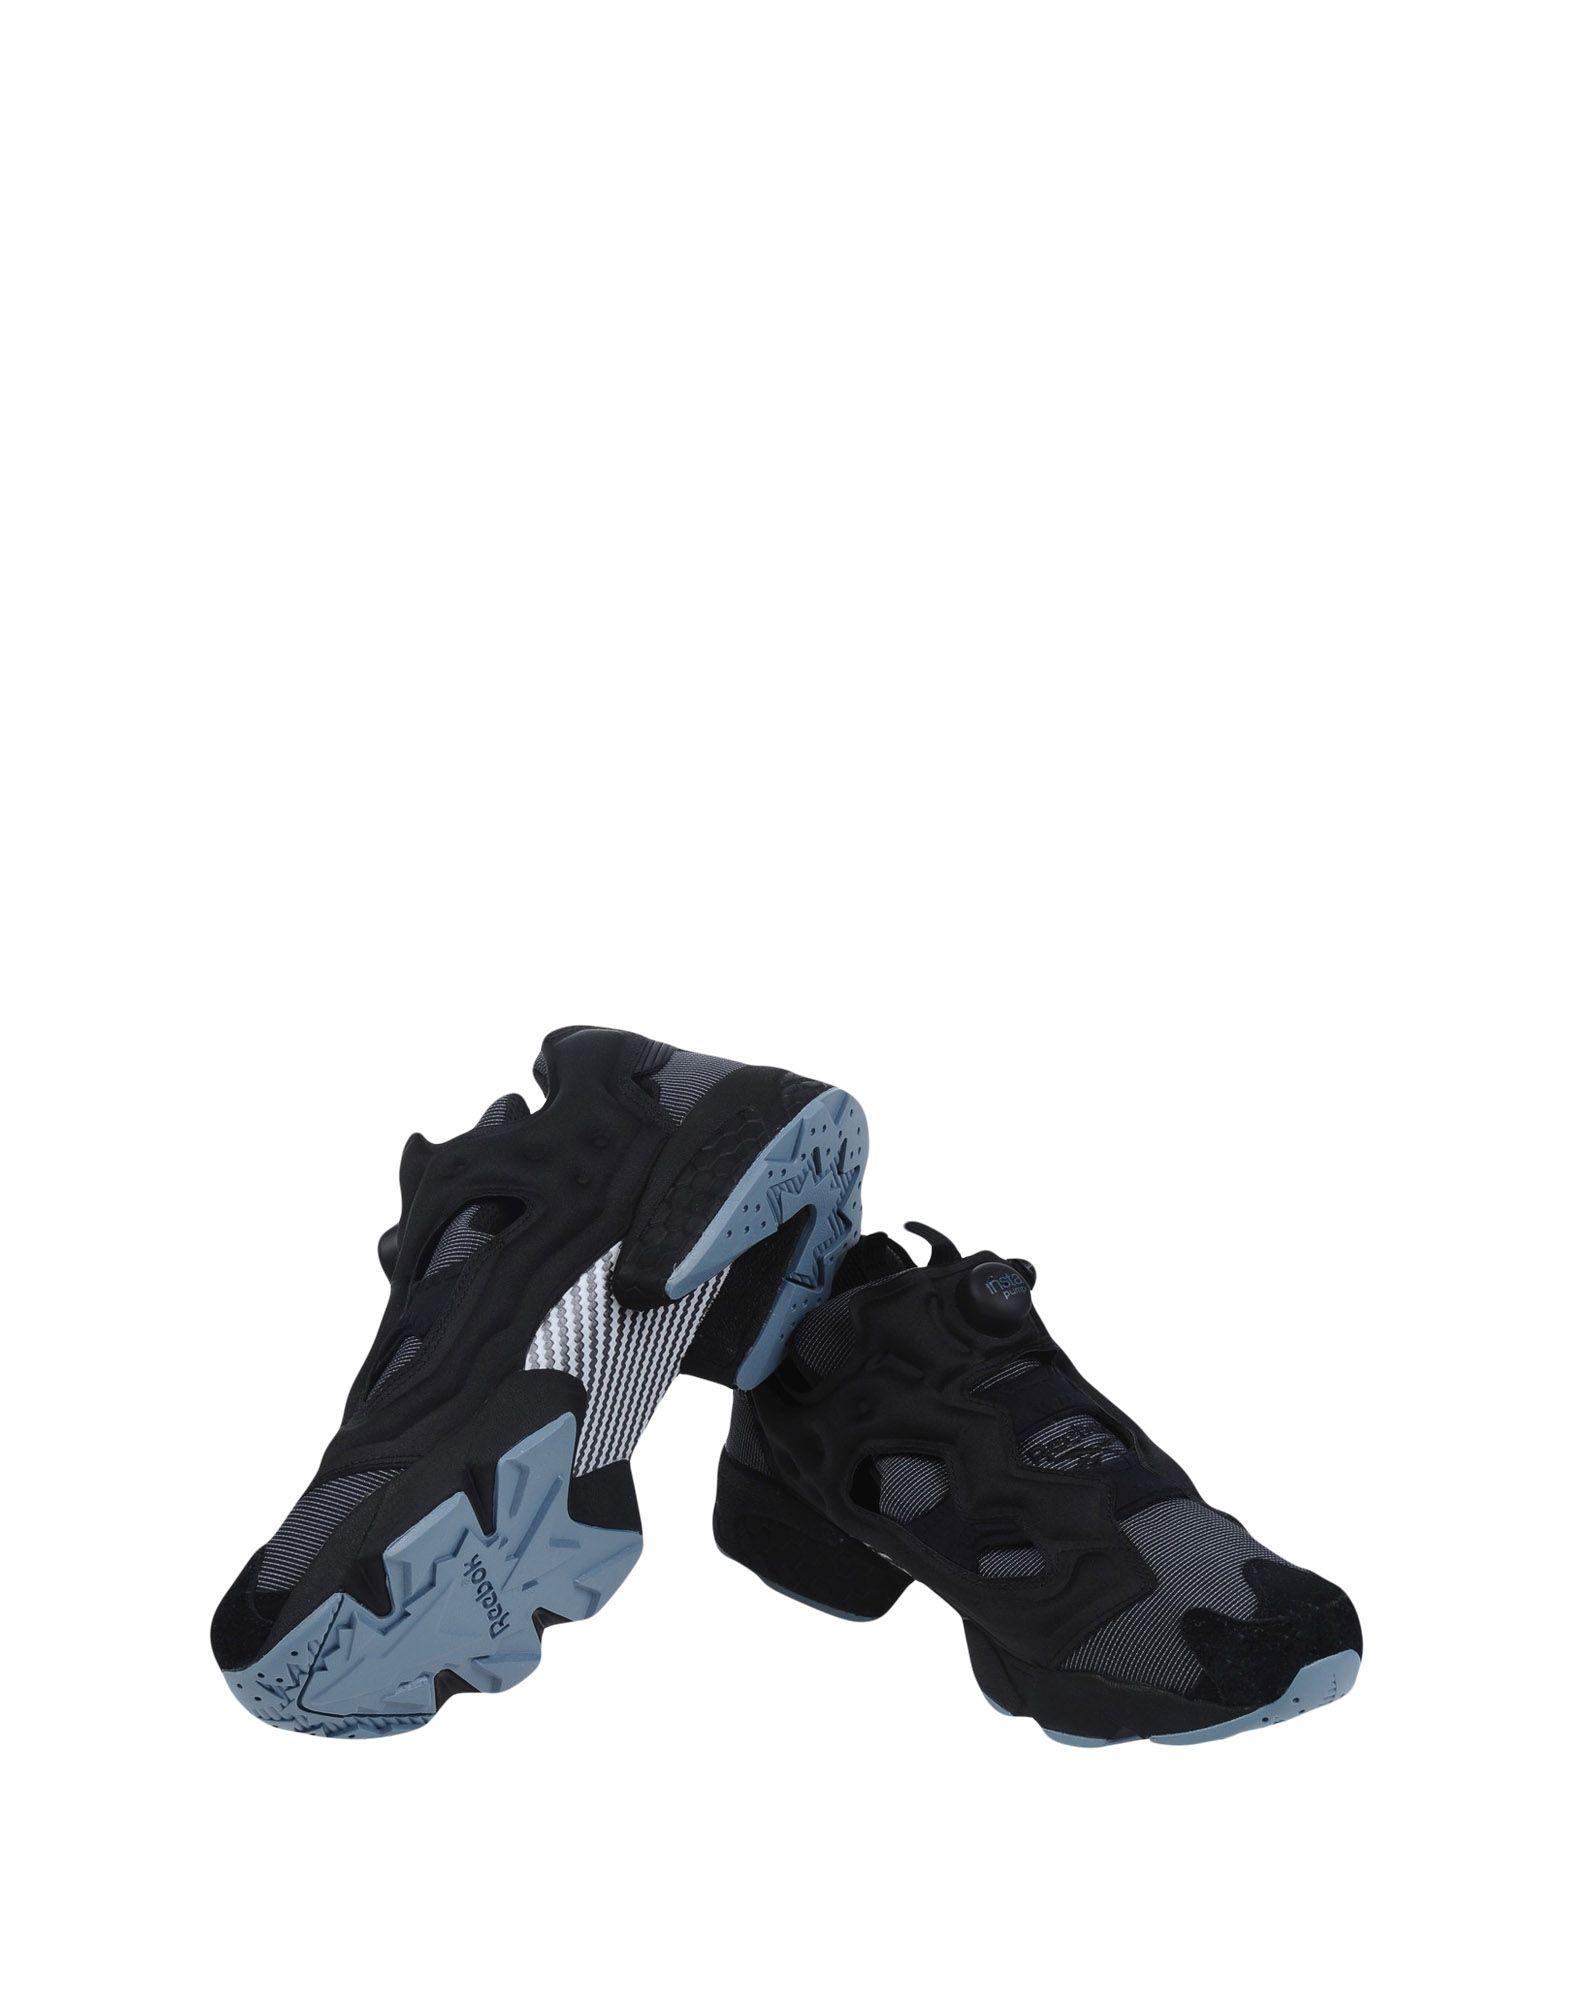 Reebok Instapump Fury Mtp - Sneakers - Men  Reebok Sneakers online on  Men Australia - 11200144NA 86f254